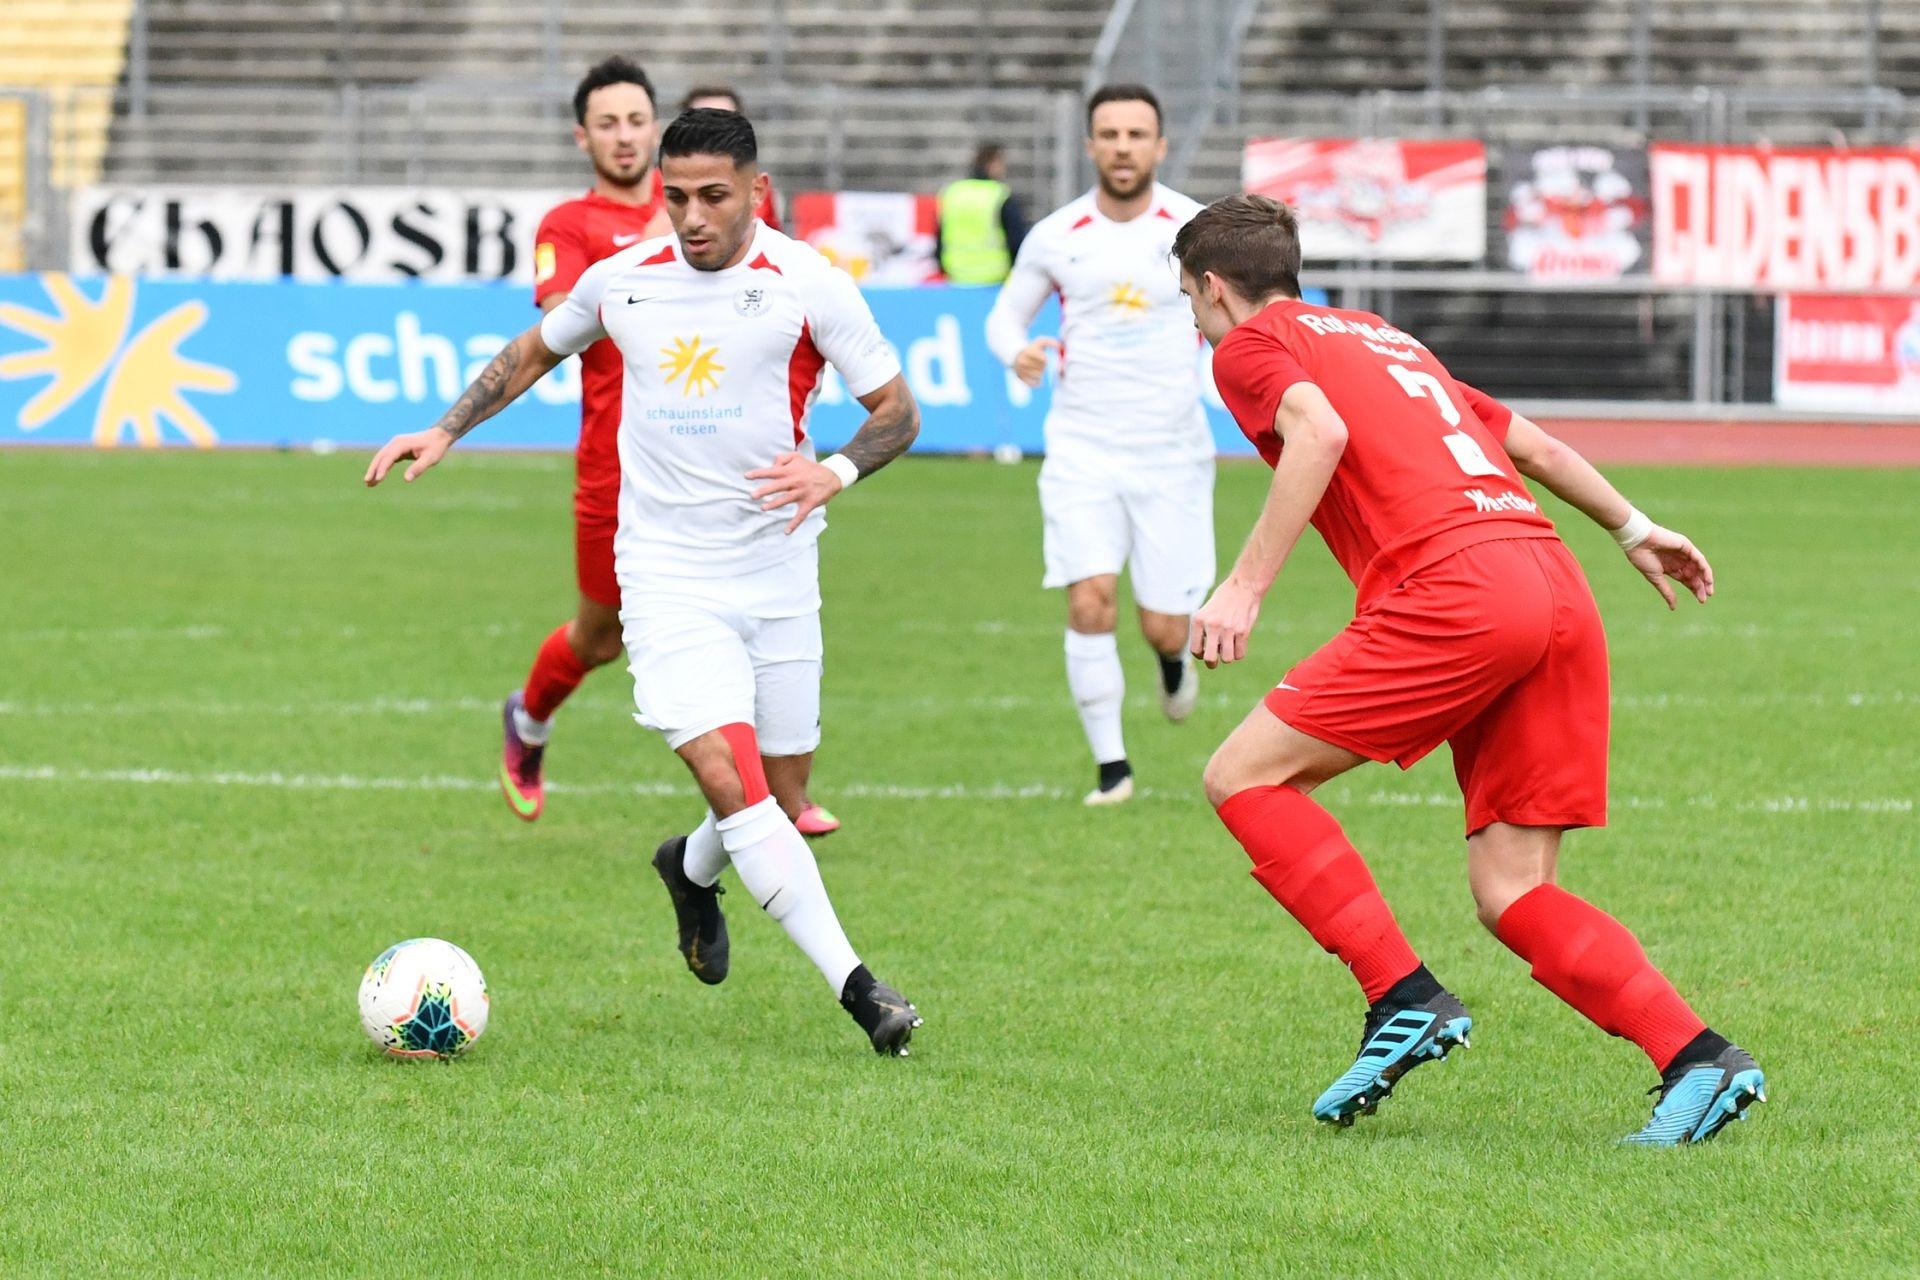 KSV Hessen Kassel, Rot-Weiss Walldorf, Endstand 4:0, Nael Najjar (KSV Hessen Kassel)